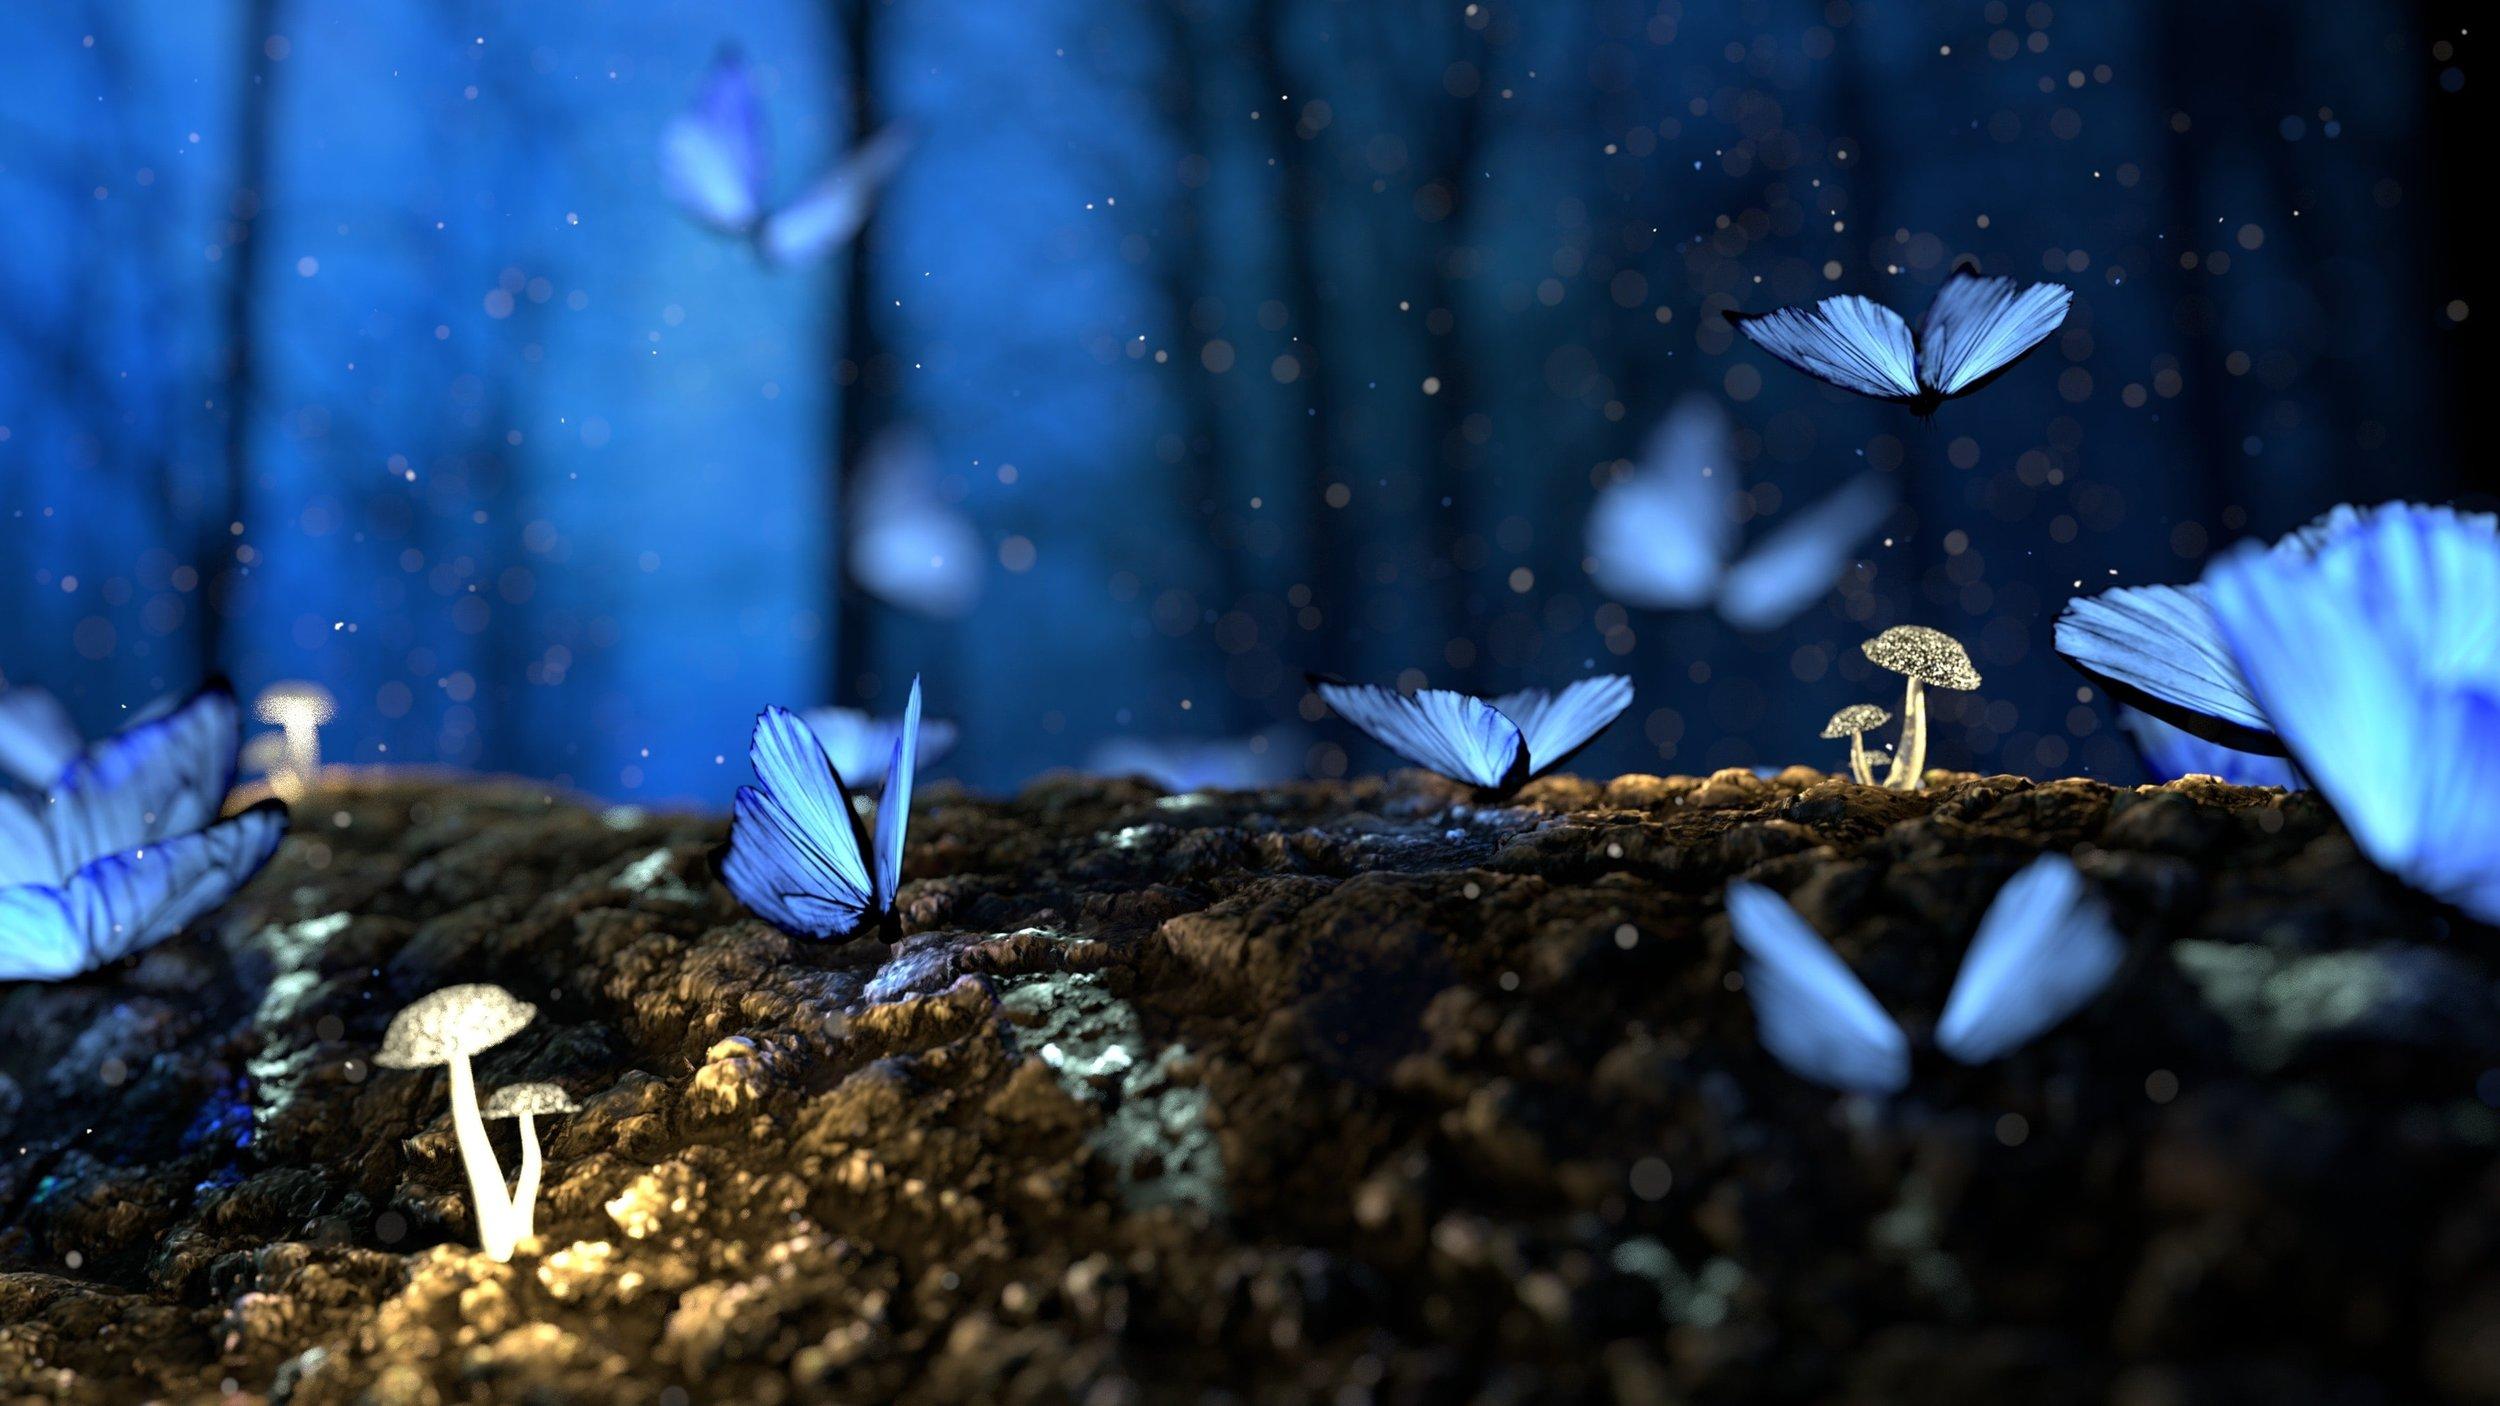 Blue butterflies indicate Hope